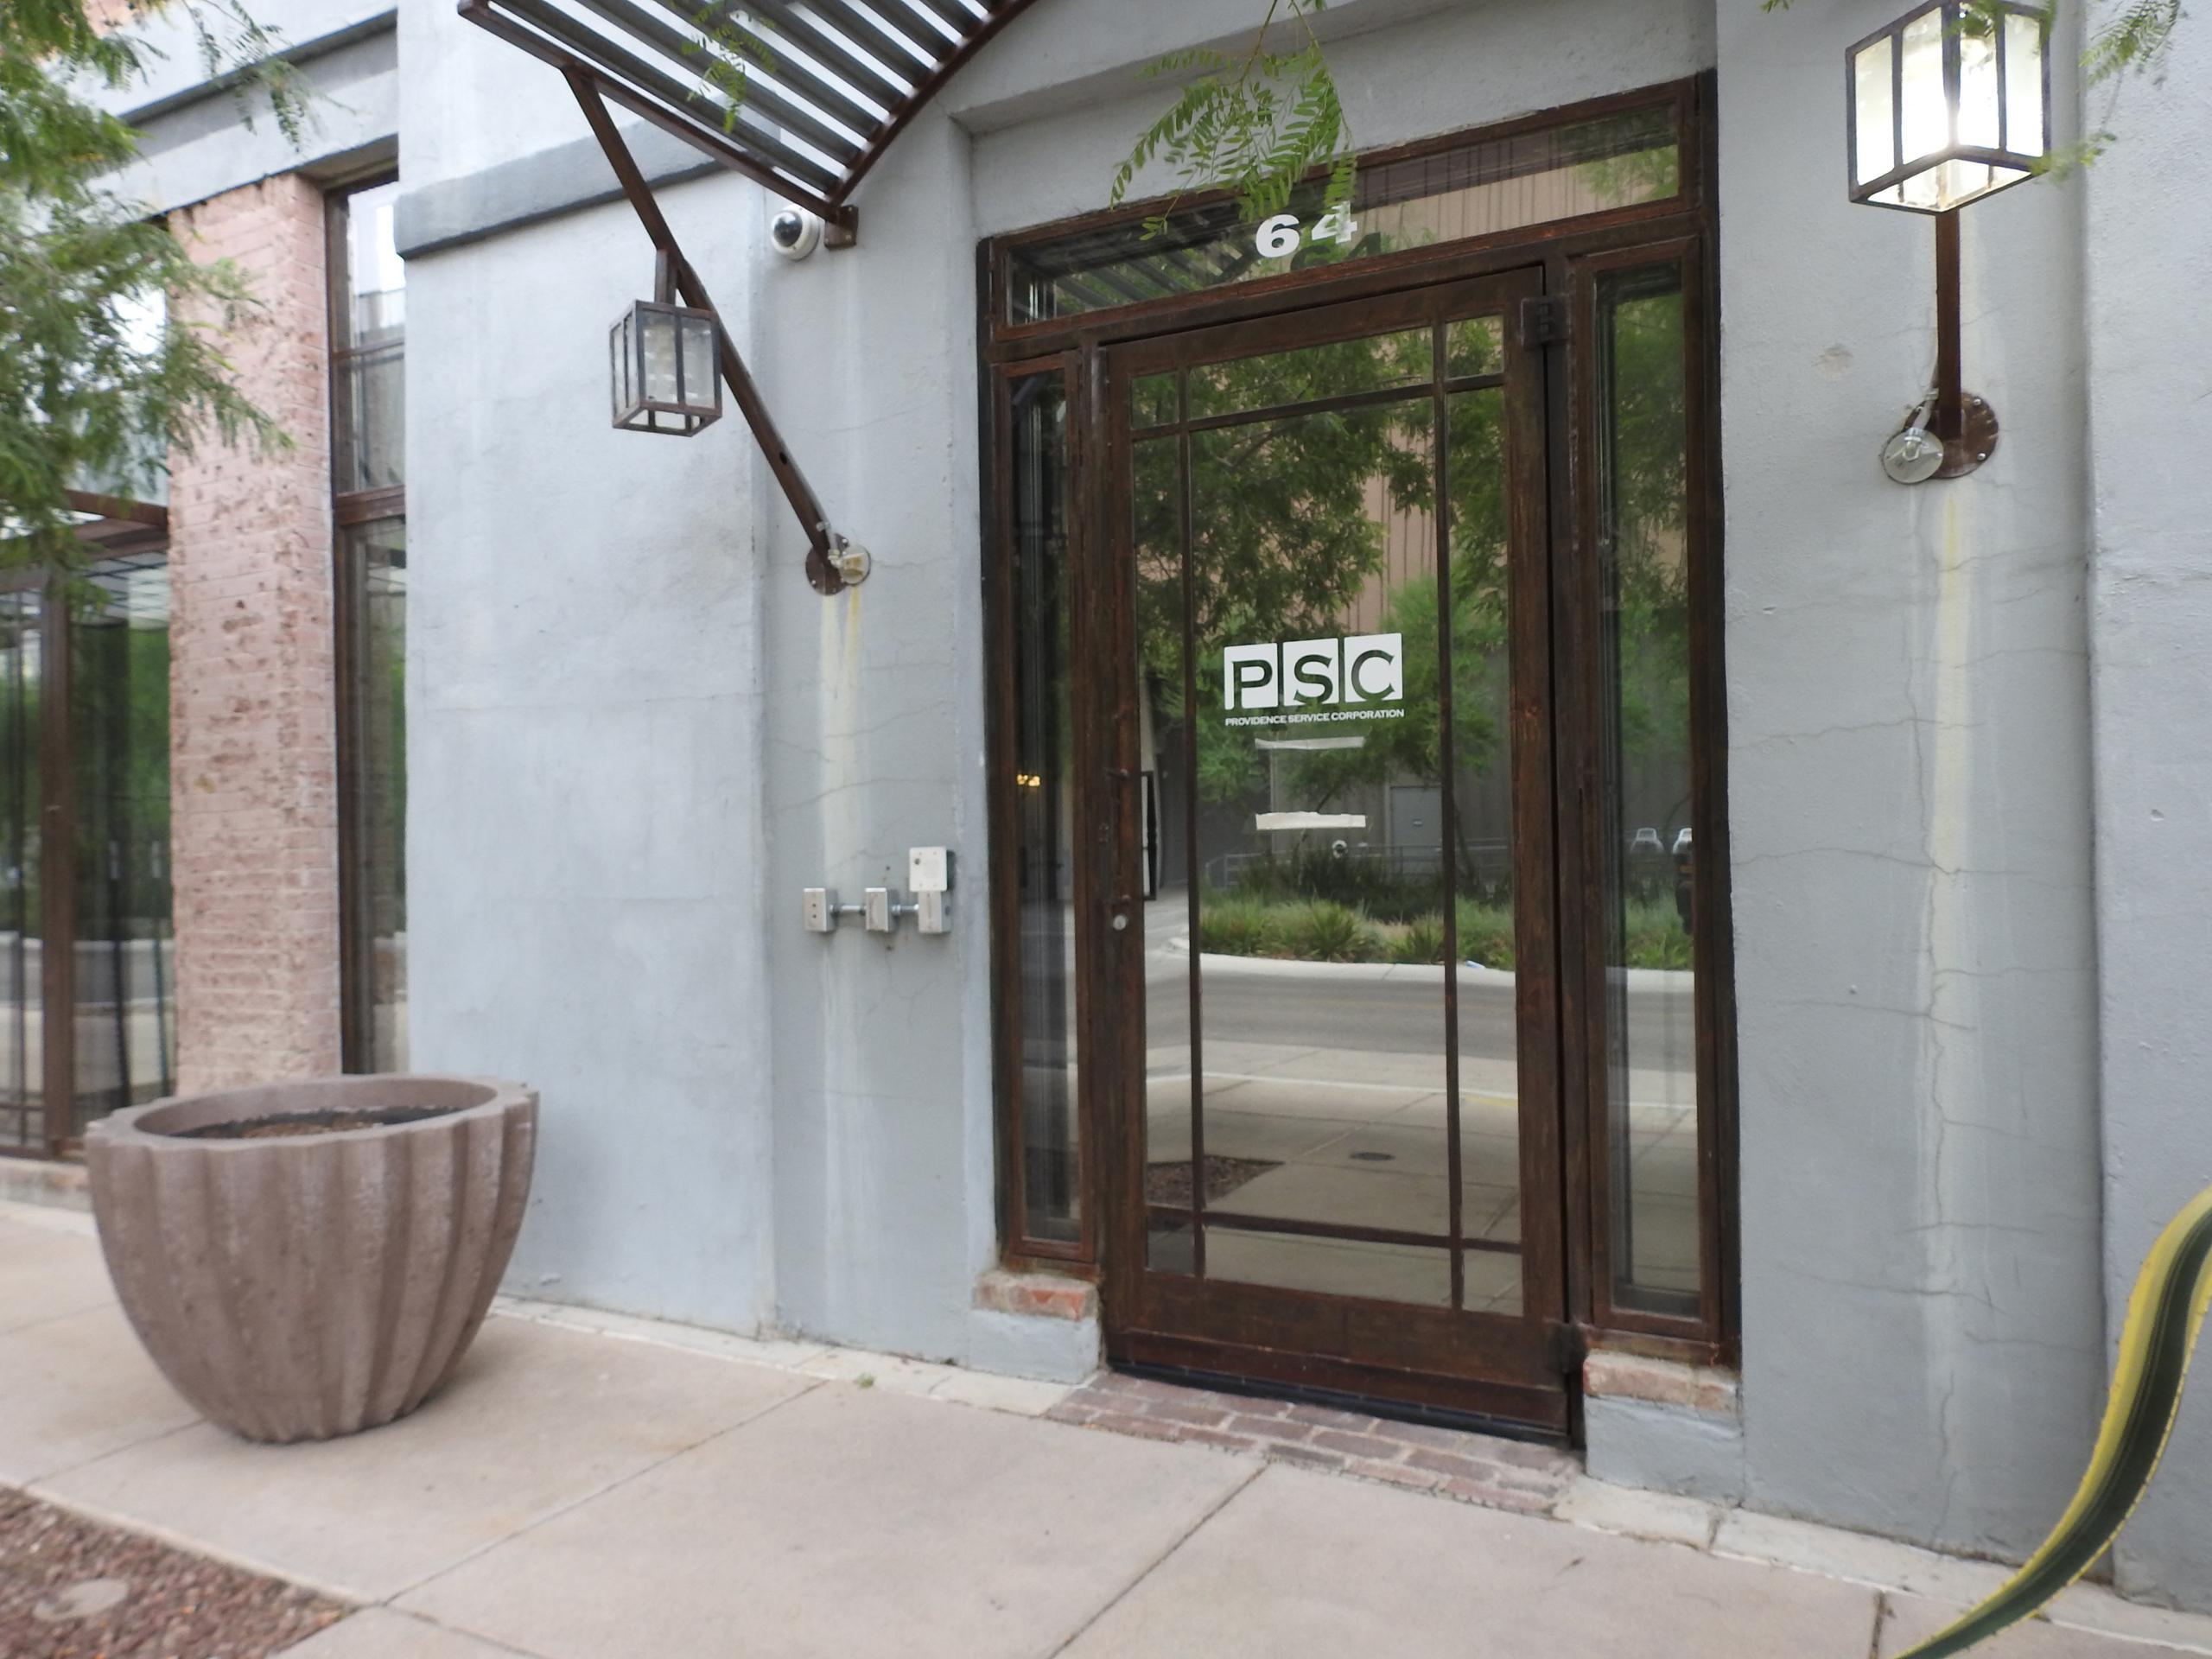 Entrance to Providence Service's corporate headquarters in Tucson, Arizona.